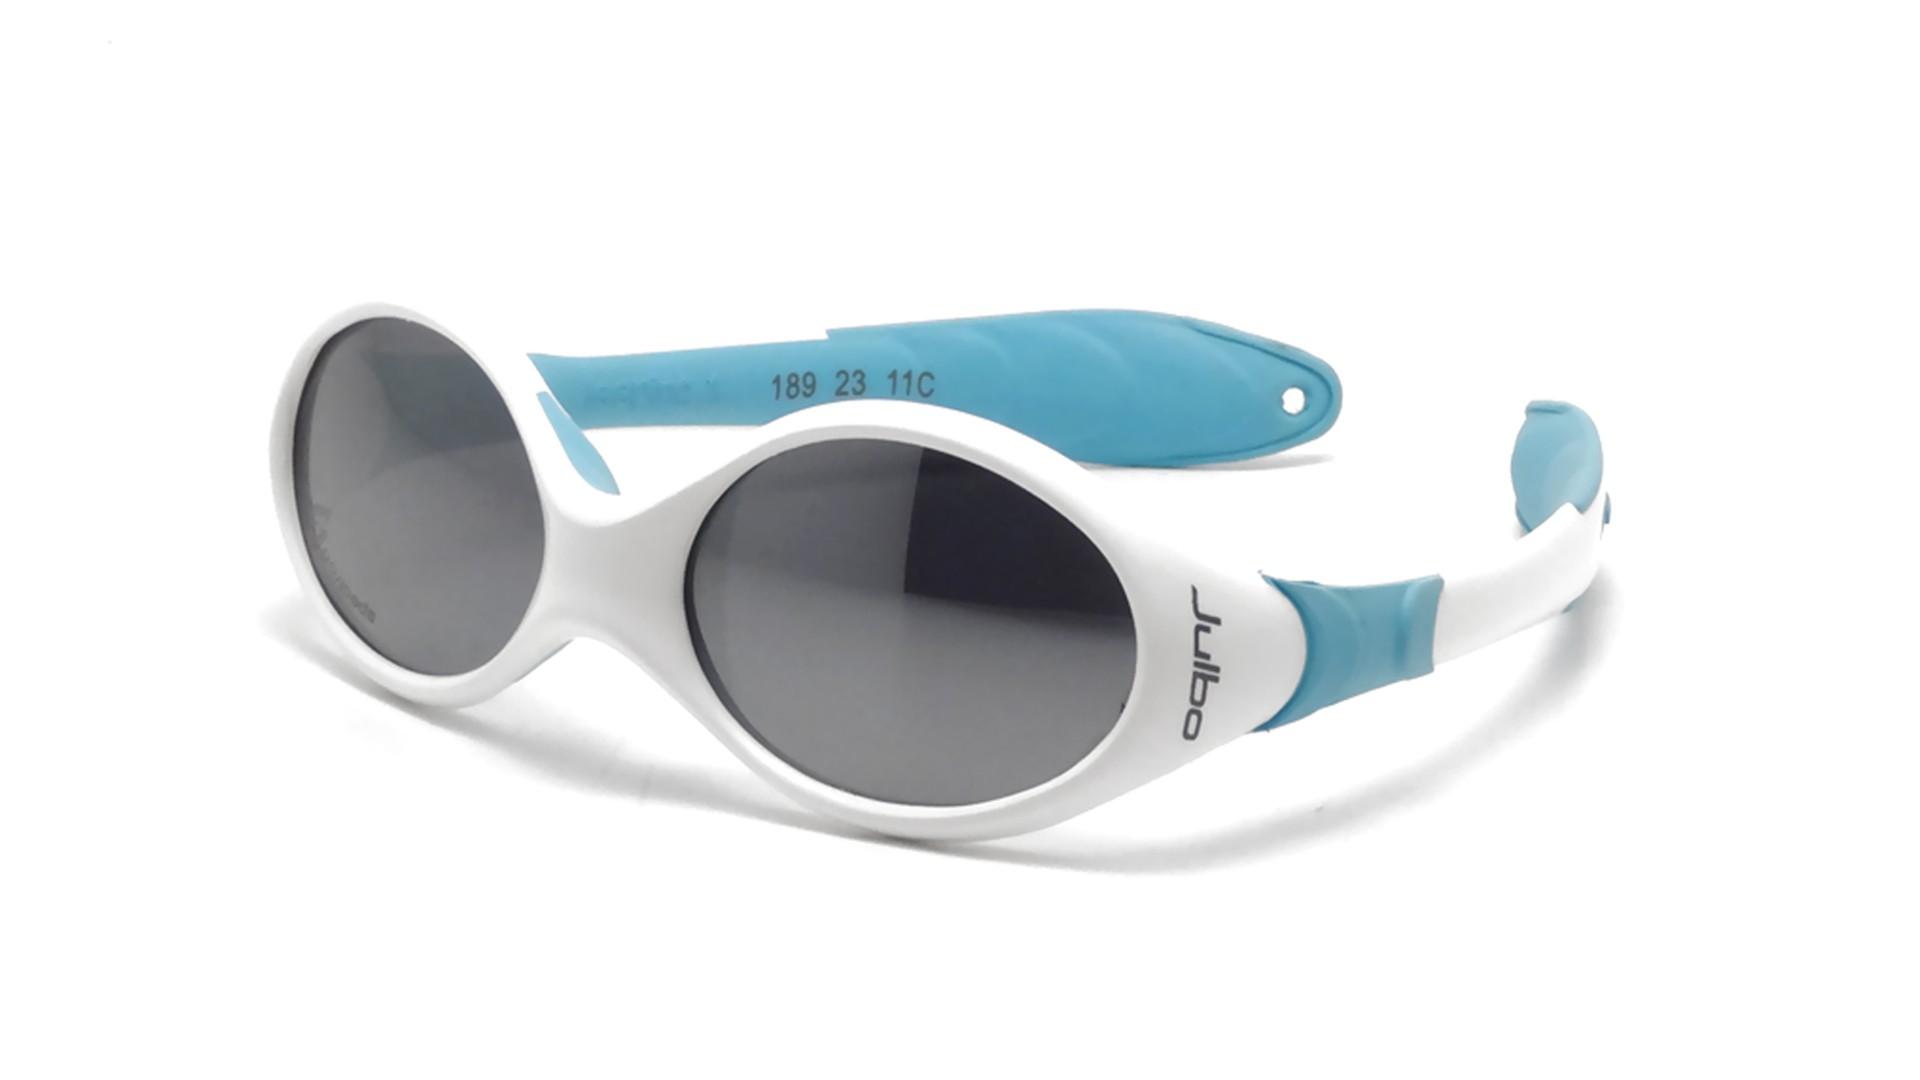 4a0088e9f94d7 Sunglasses Julbo Looping 1 White J89 23 C 39-3 Baby 0-18 month Mirror